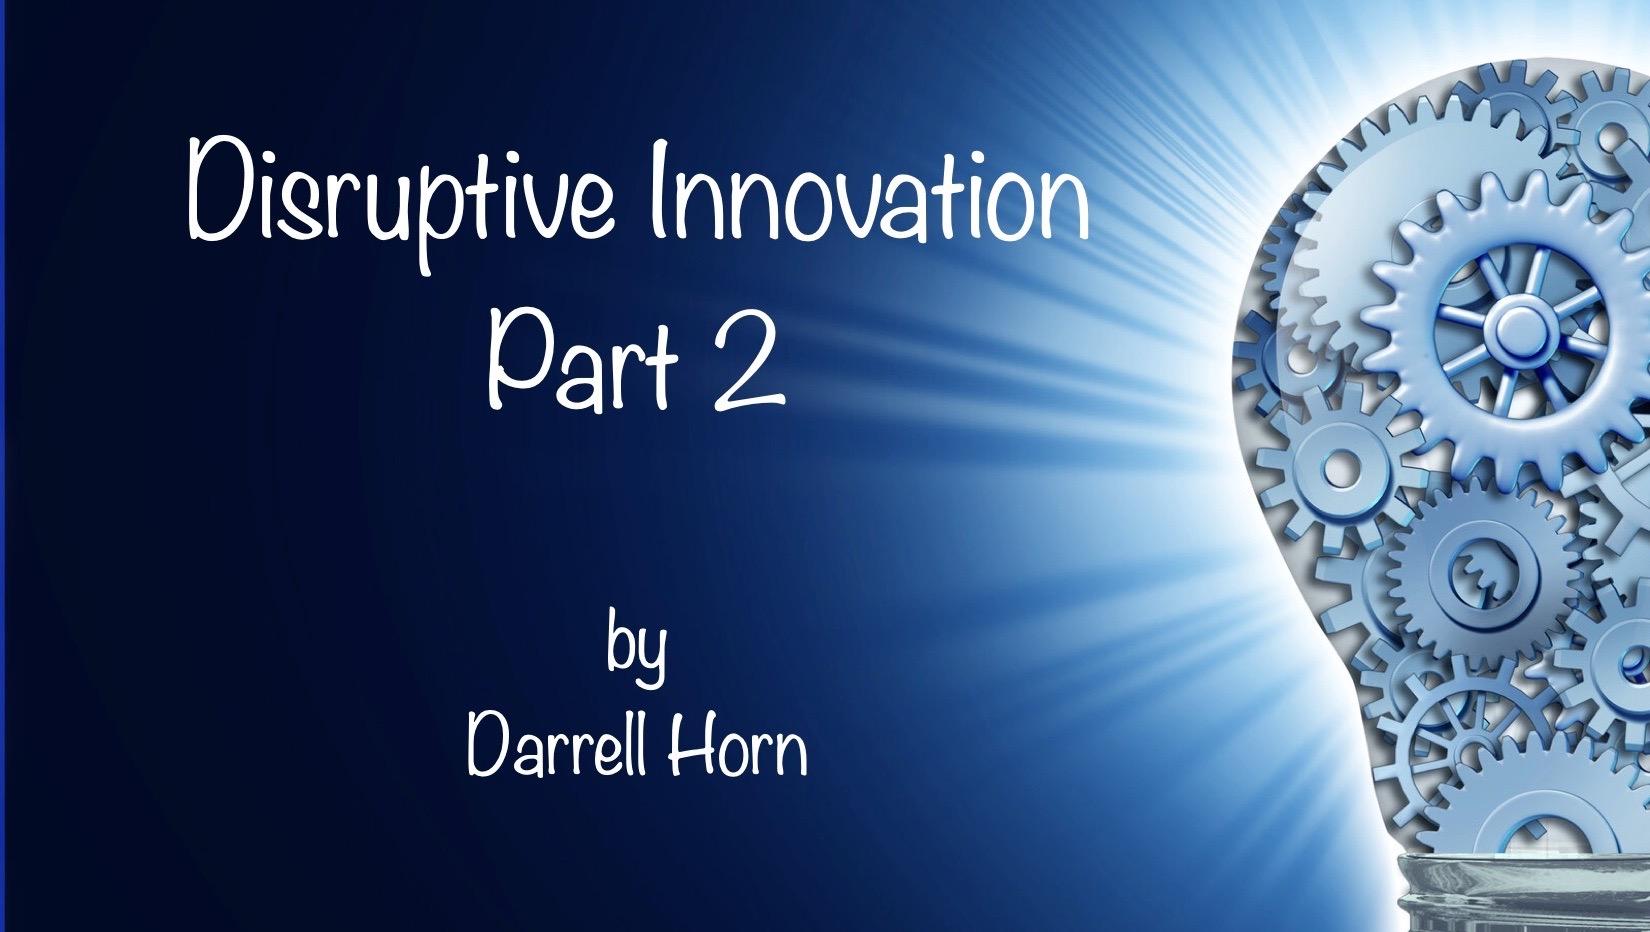 disruptive innovation part 2